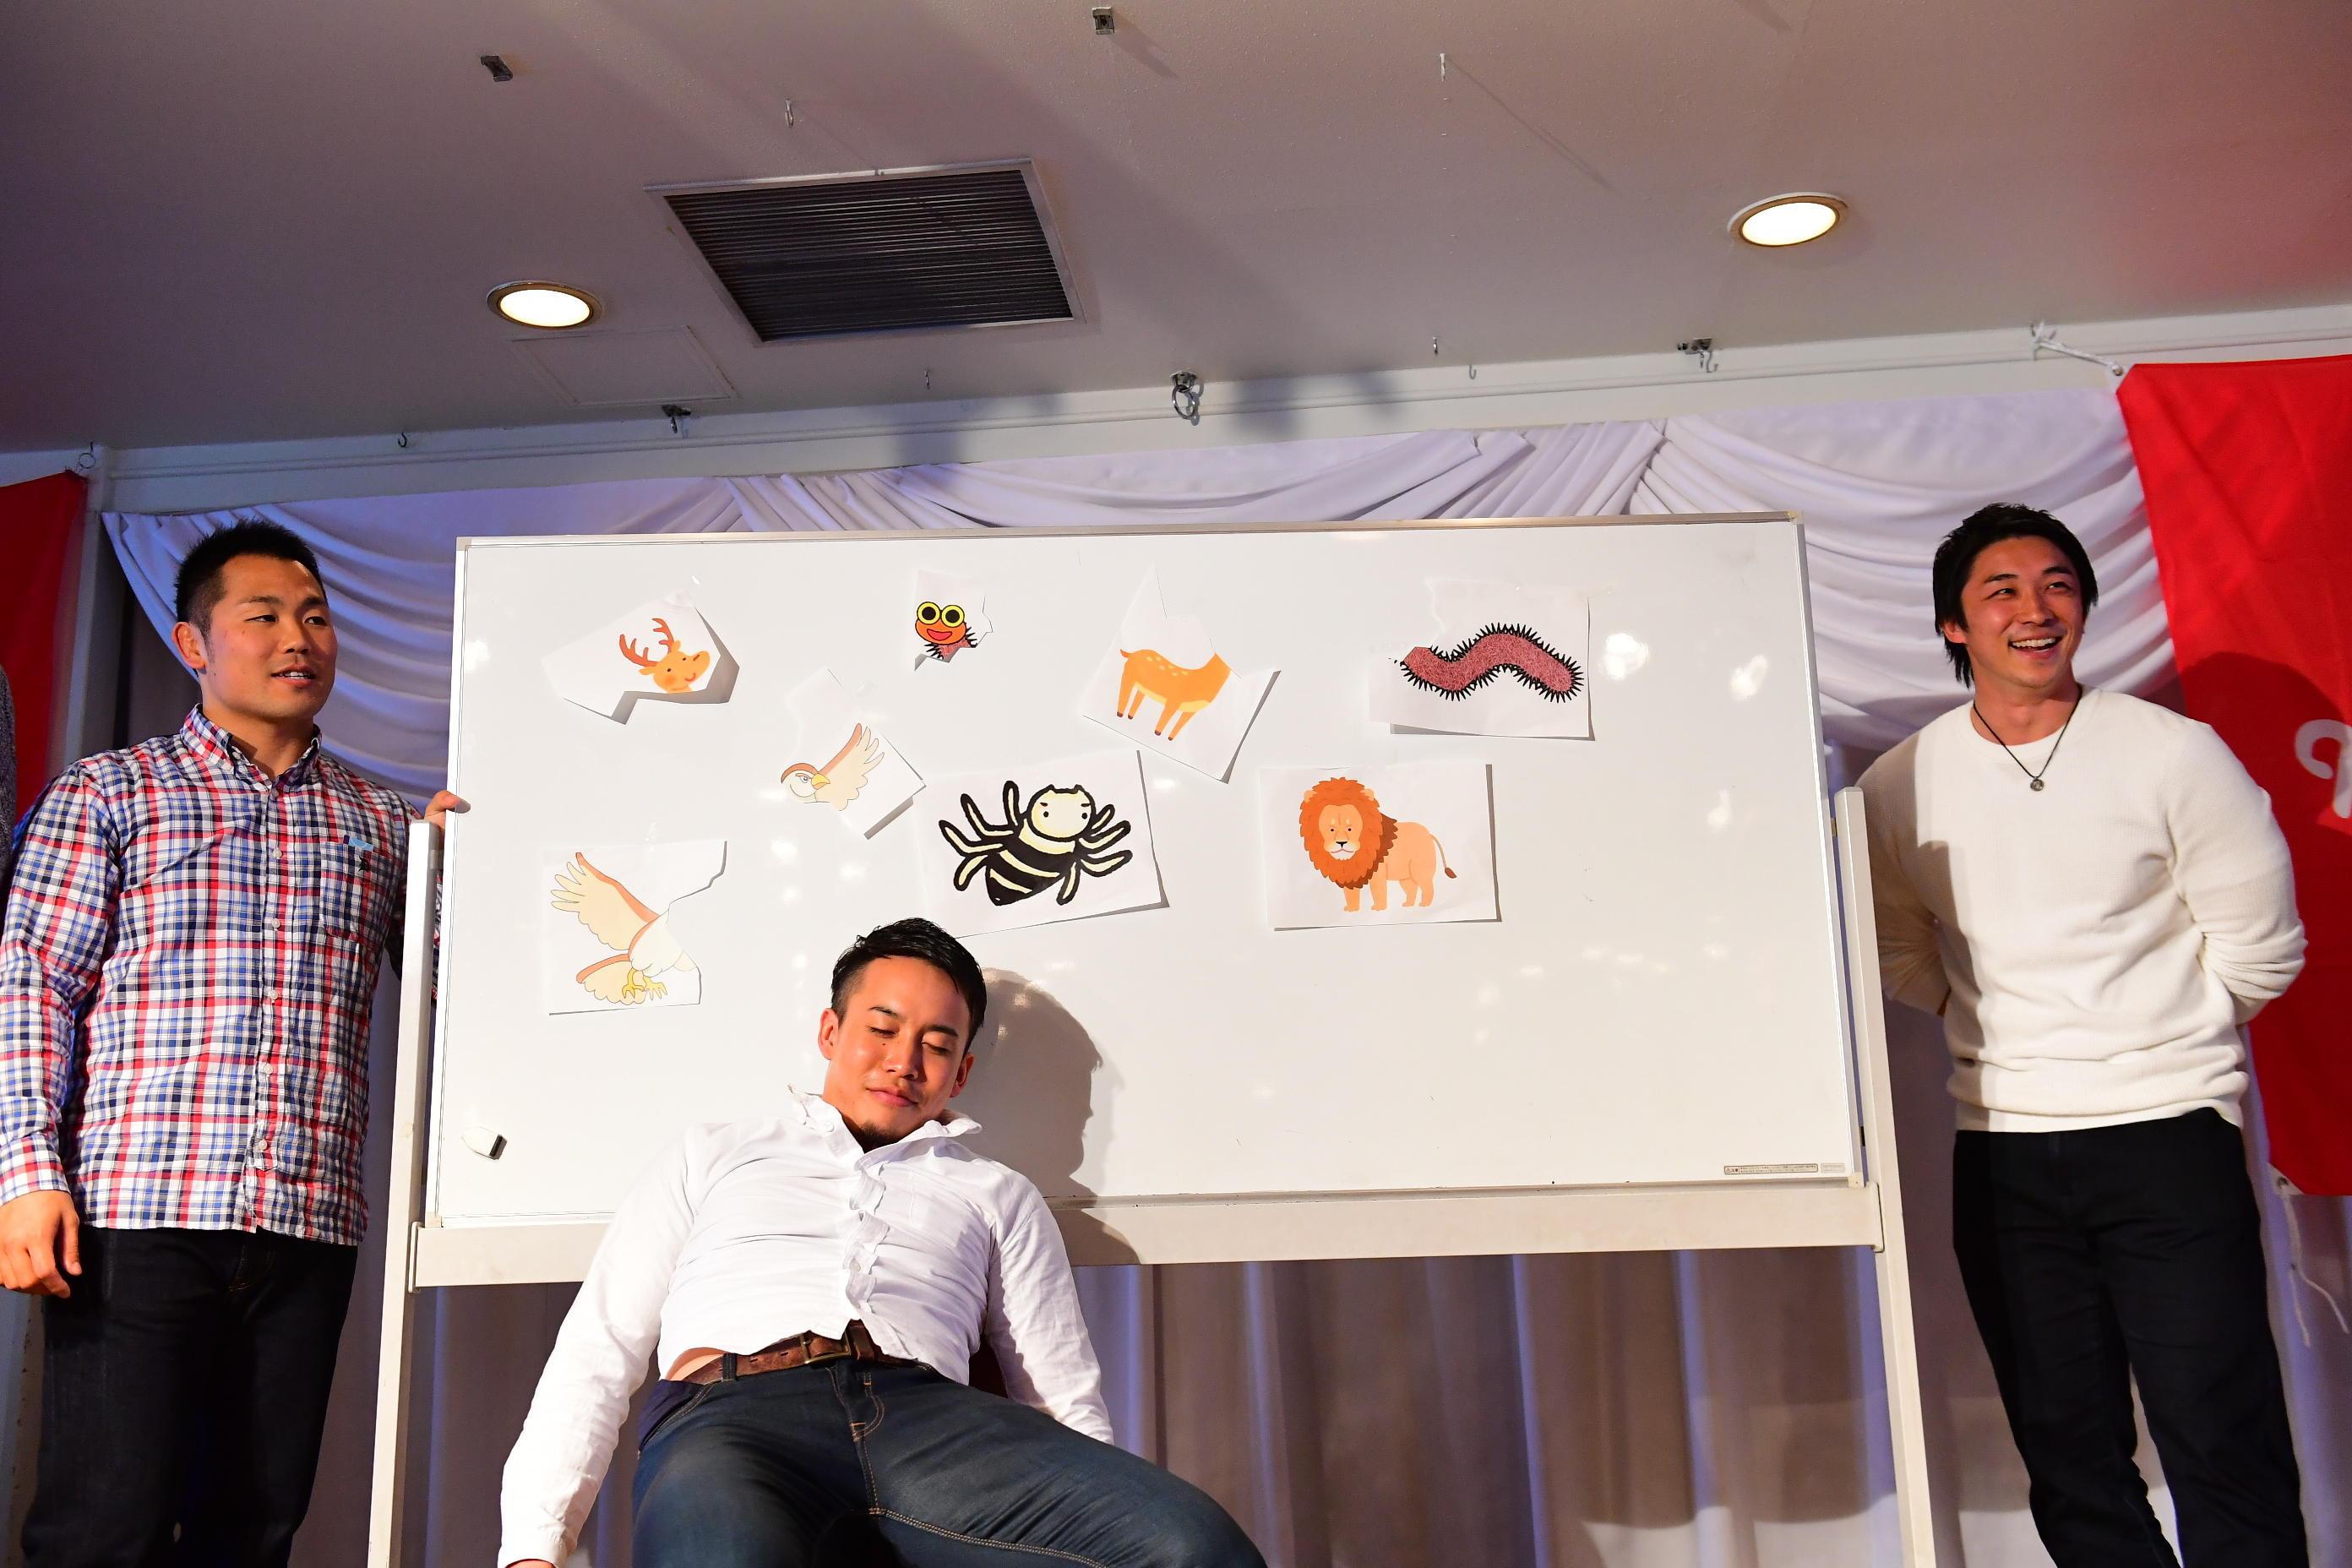 http://news.yoshimoto.co.jp/20170314170524-33128da6dadddea0981044b420126cb80f136c8e.jpg